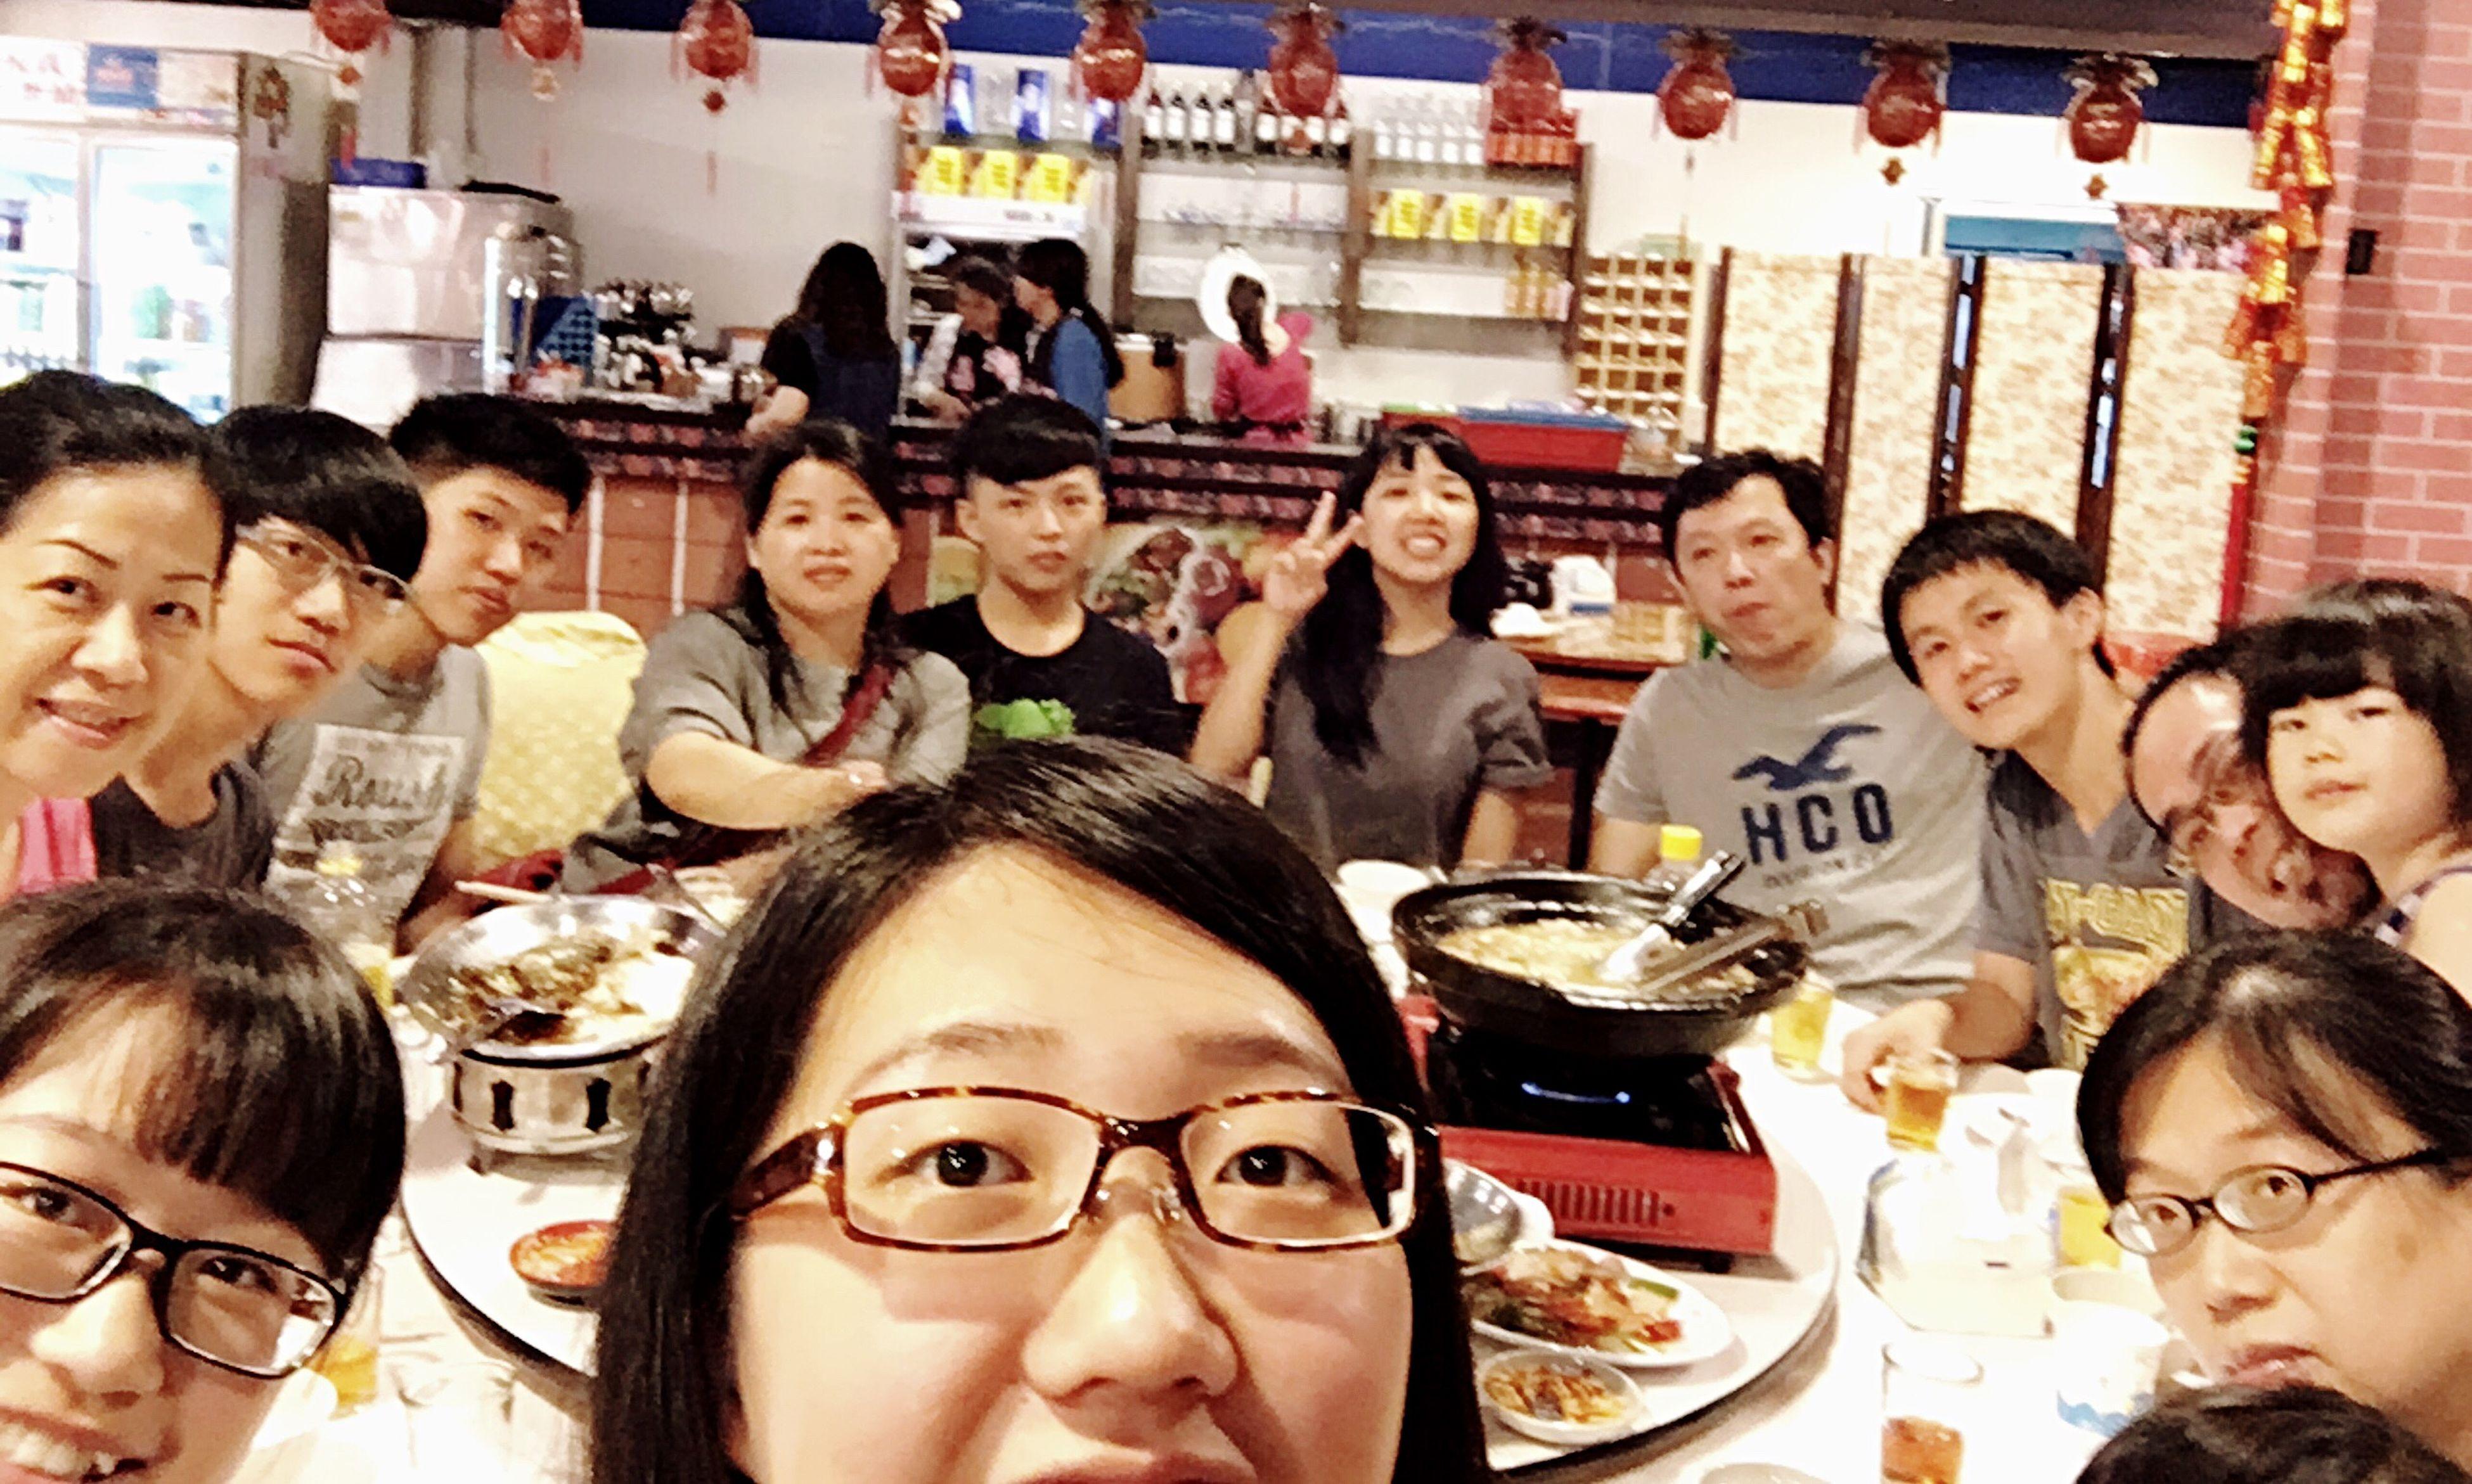 讓我來說說掌鏡人的悲哀吧⋯⋯。我說完了。 Chinese Culture Chinese Food Hakka Family❤ Family Time The Portraitist - 2016 EyeEm Awards Selfie Portrait Self Portrait Selfie ✌